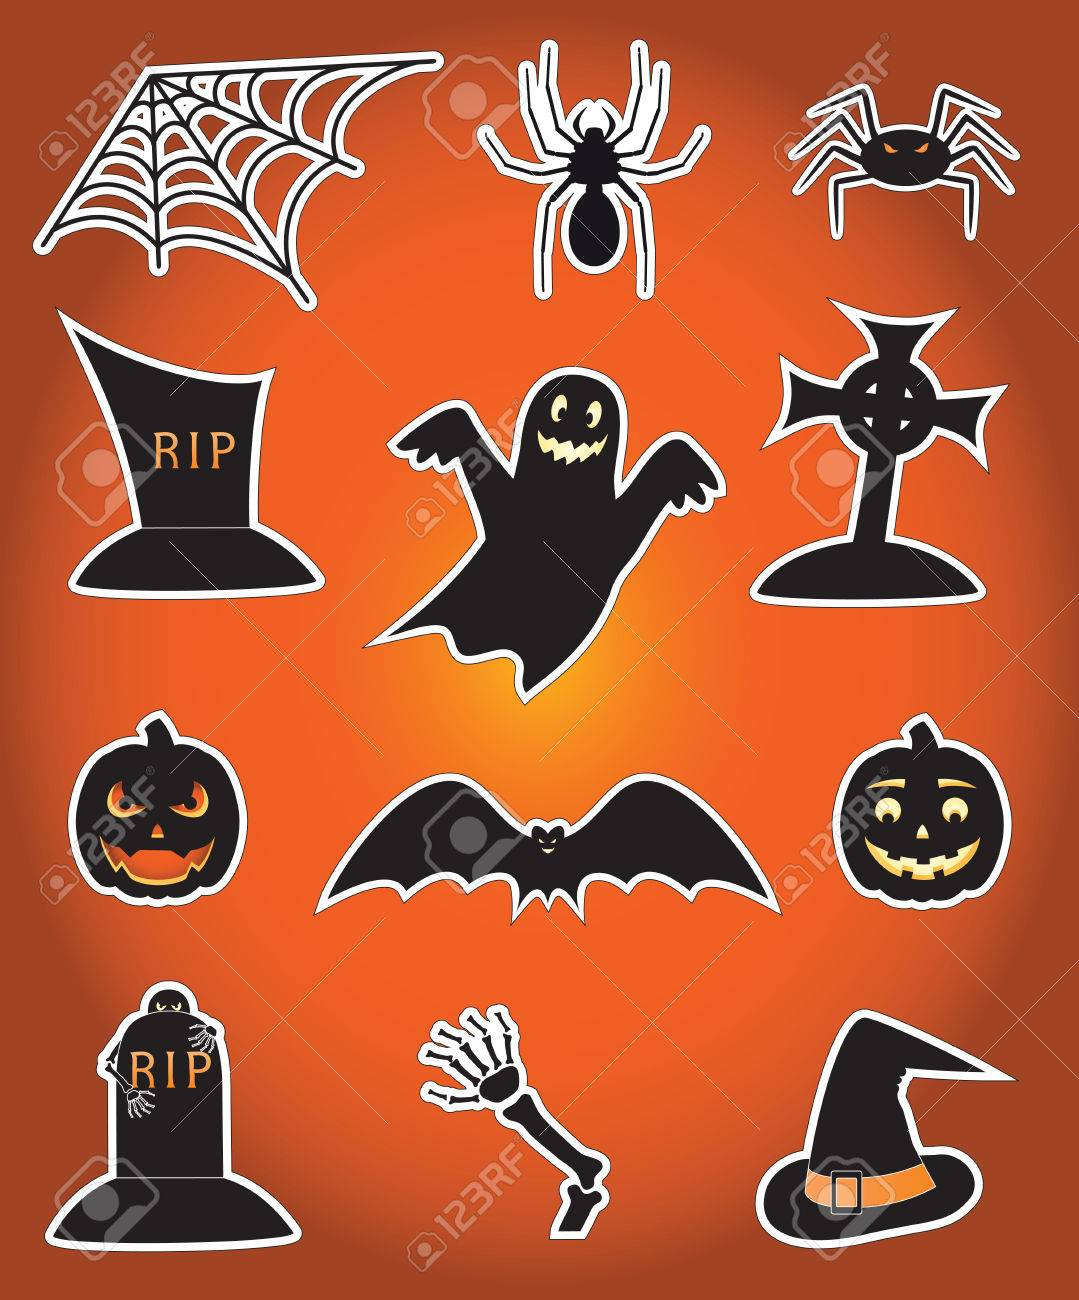 Twelve icons for Halloween, illustration Stock Vector - 5639804